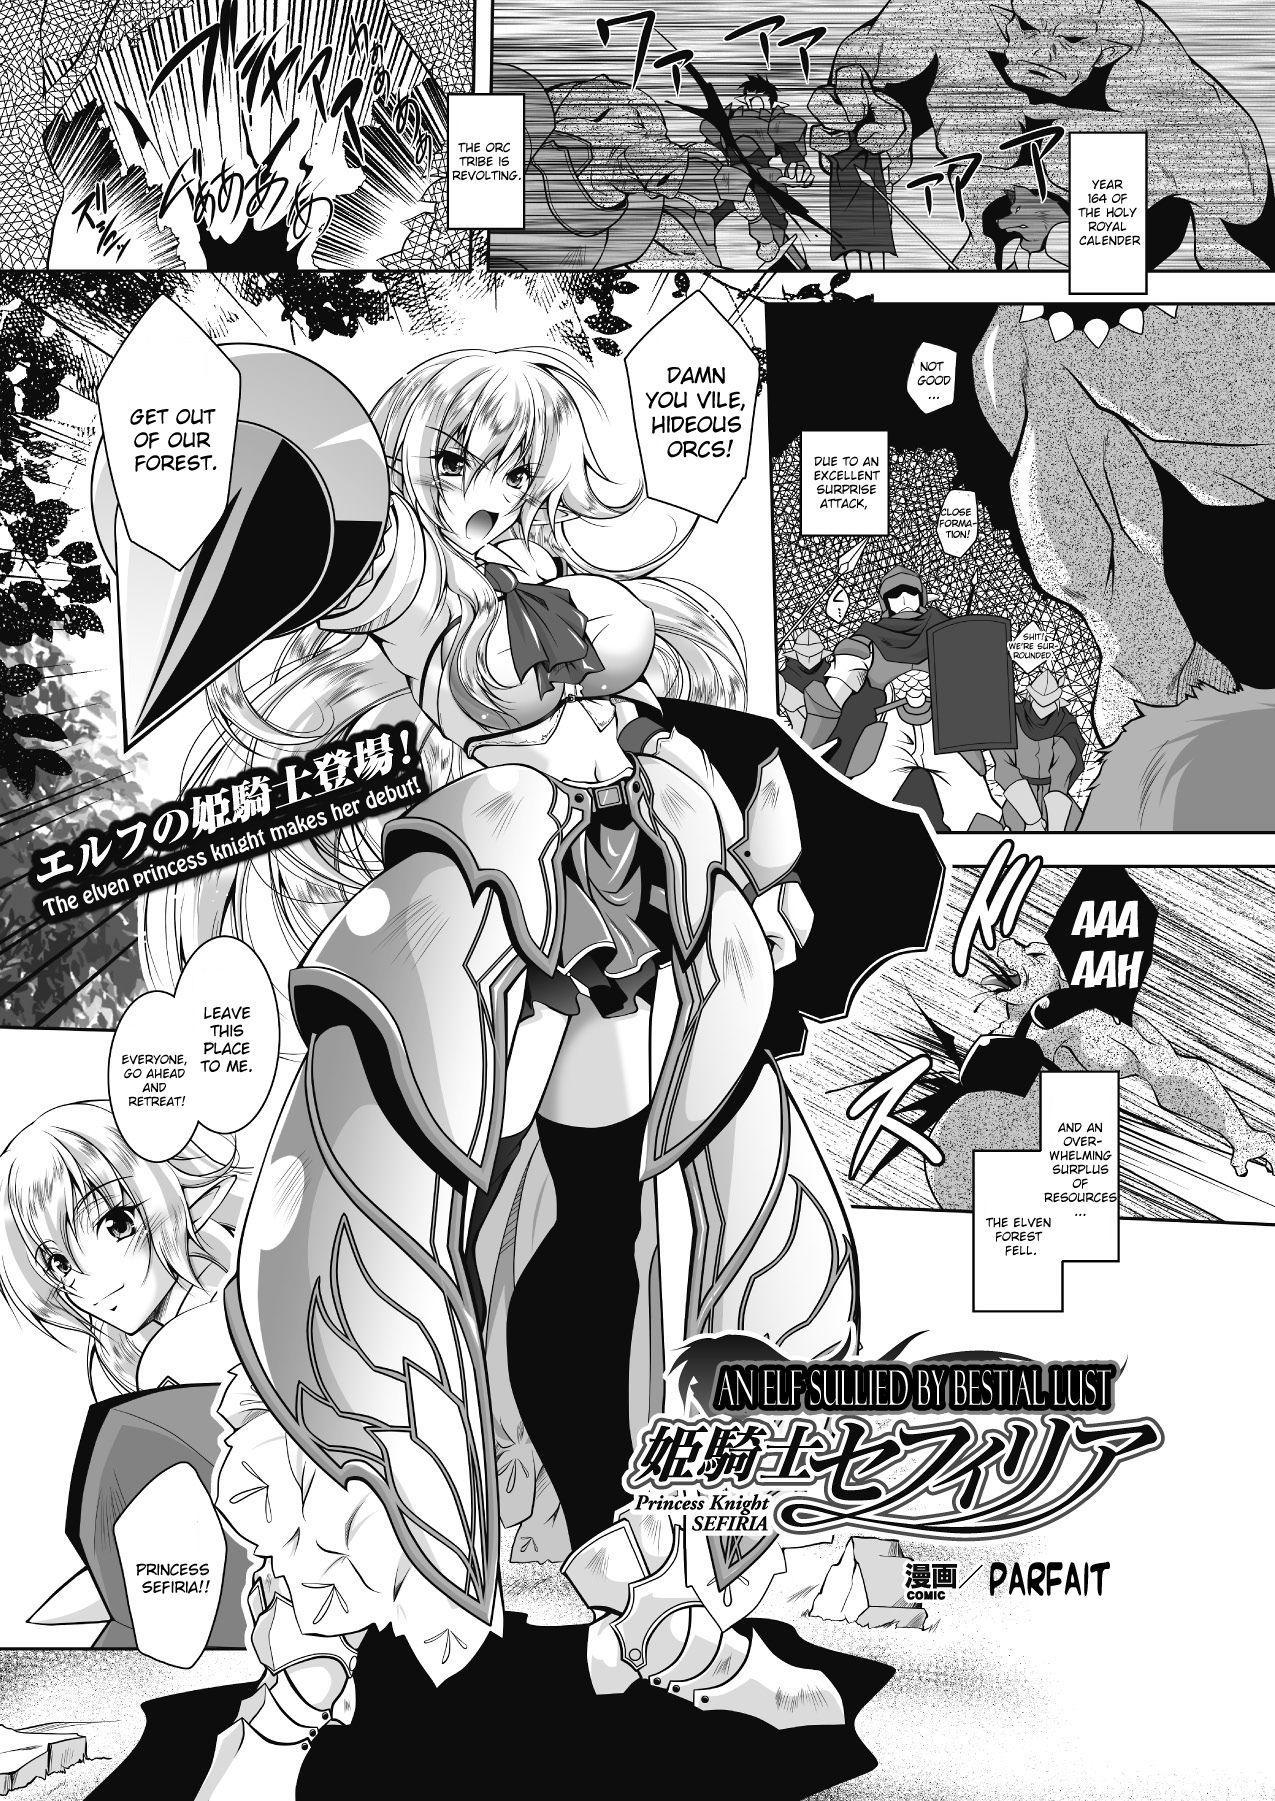 Juuyoku ni Kegareta Erufu Hime Kishi Sefiria | An Elf Sullied by Bestial Lust Princess Knight Sefiria 0